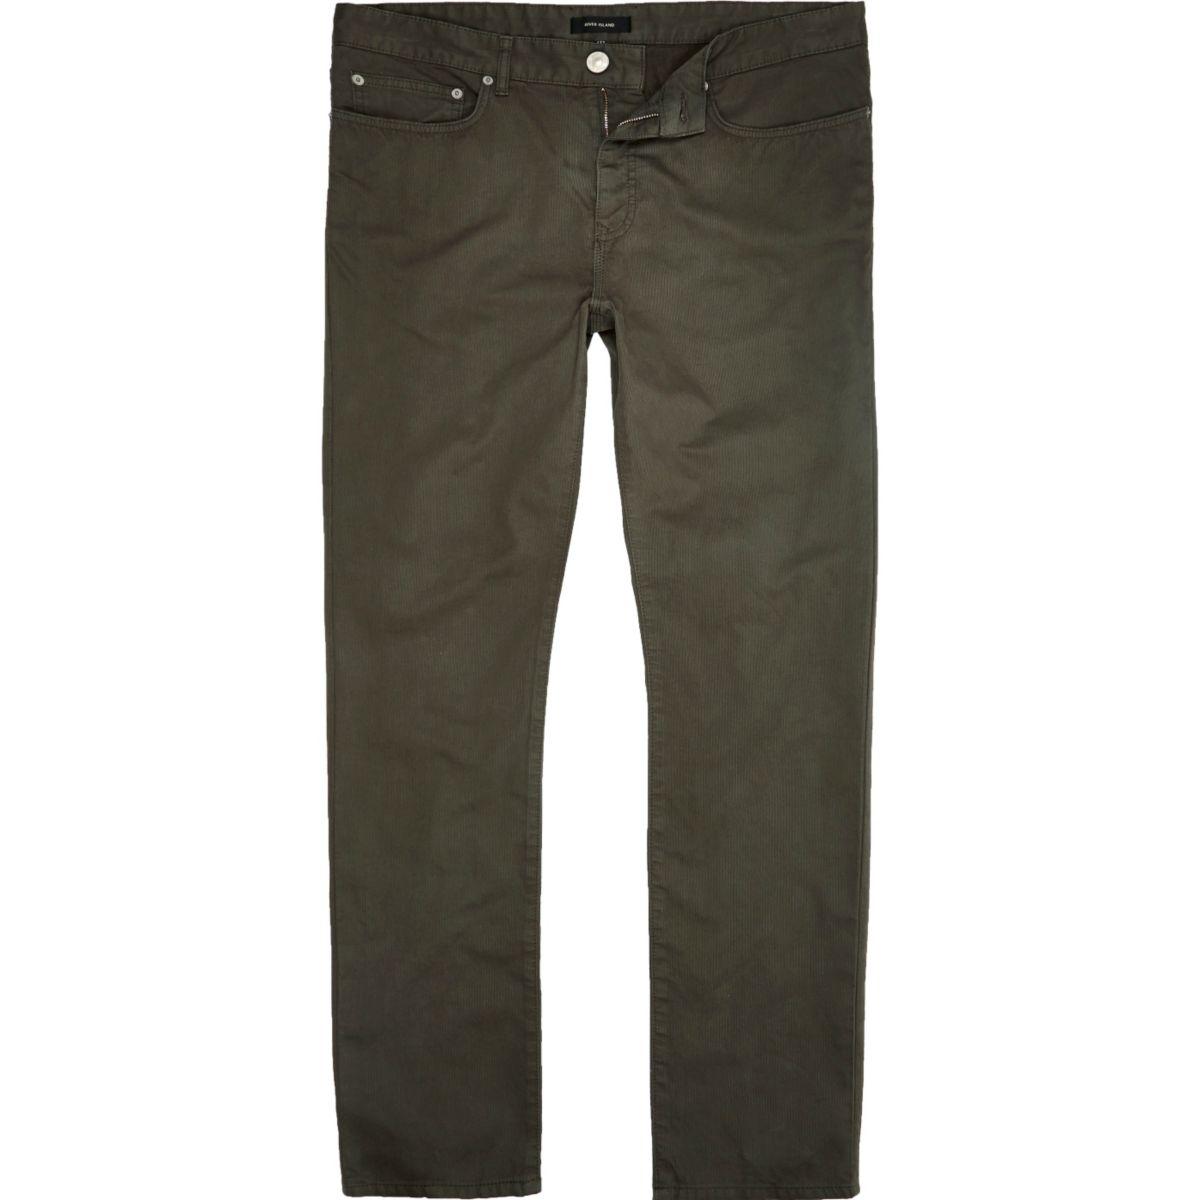 Khaki green slim fit cotton cords